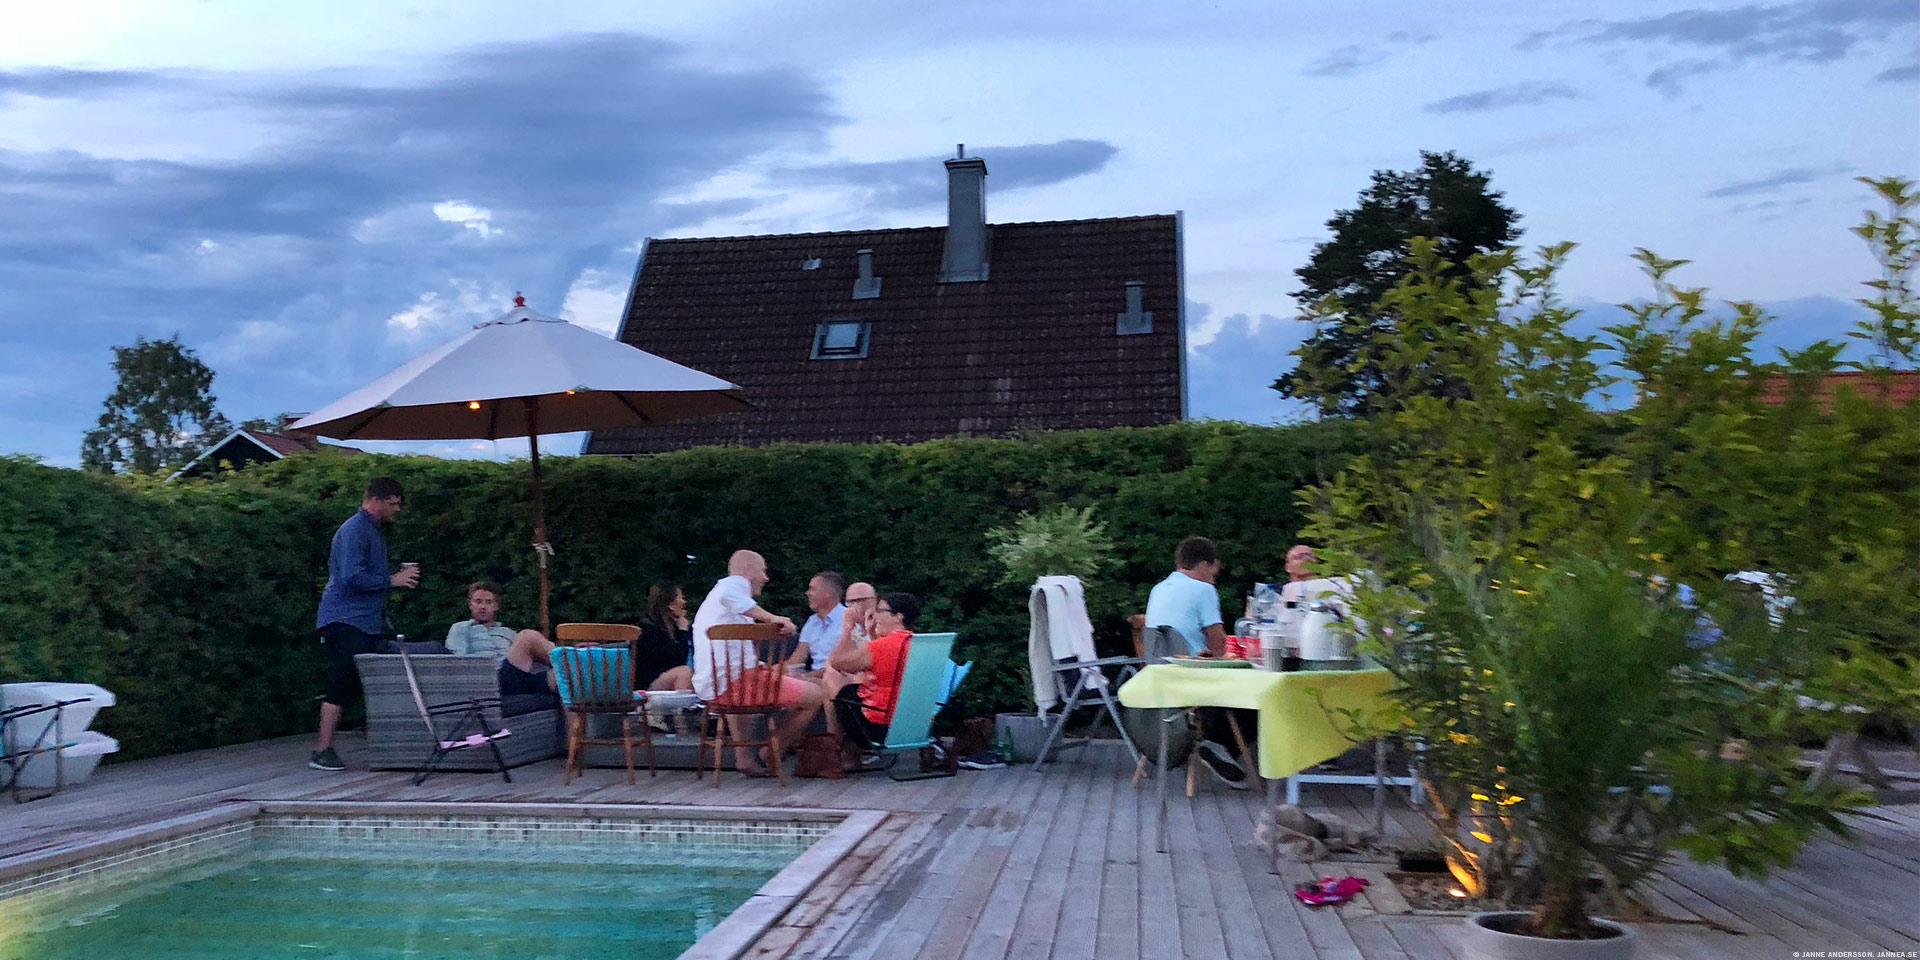 Sommar- och semesterfest |© Janne A